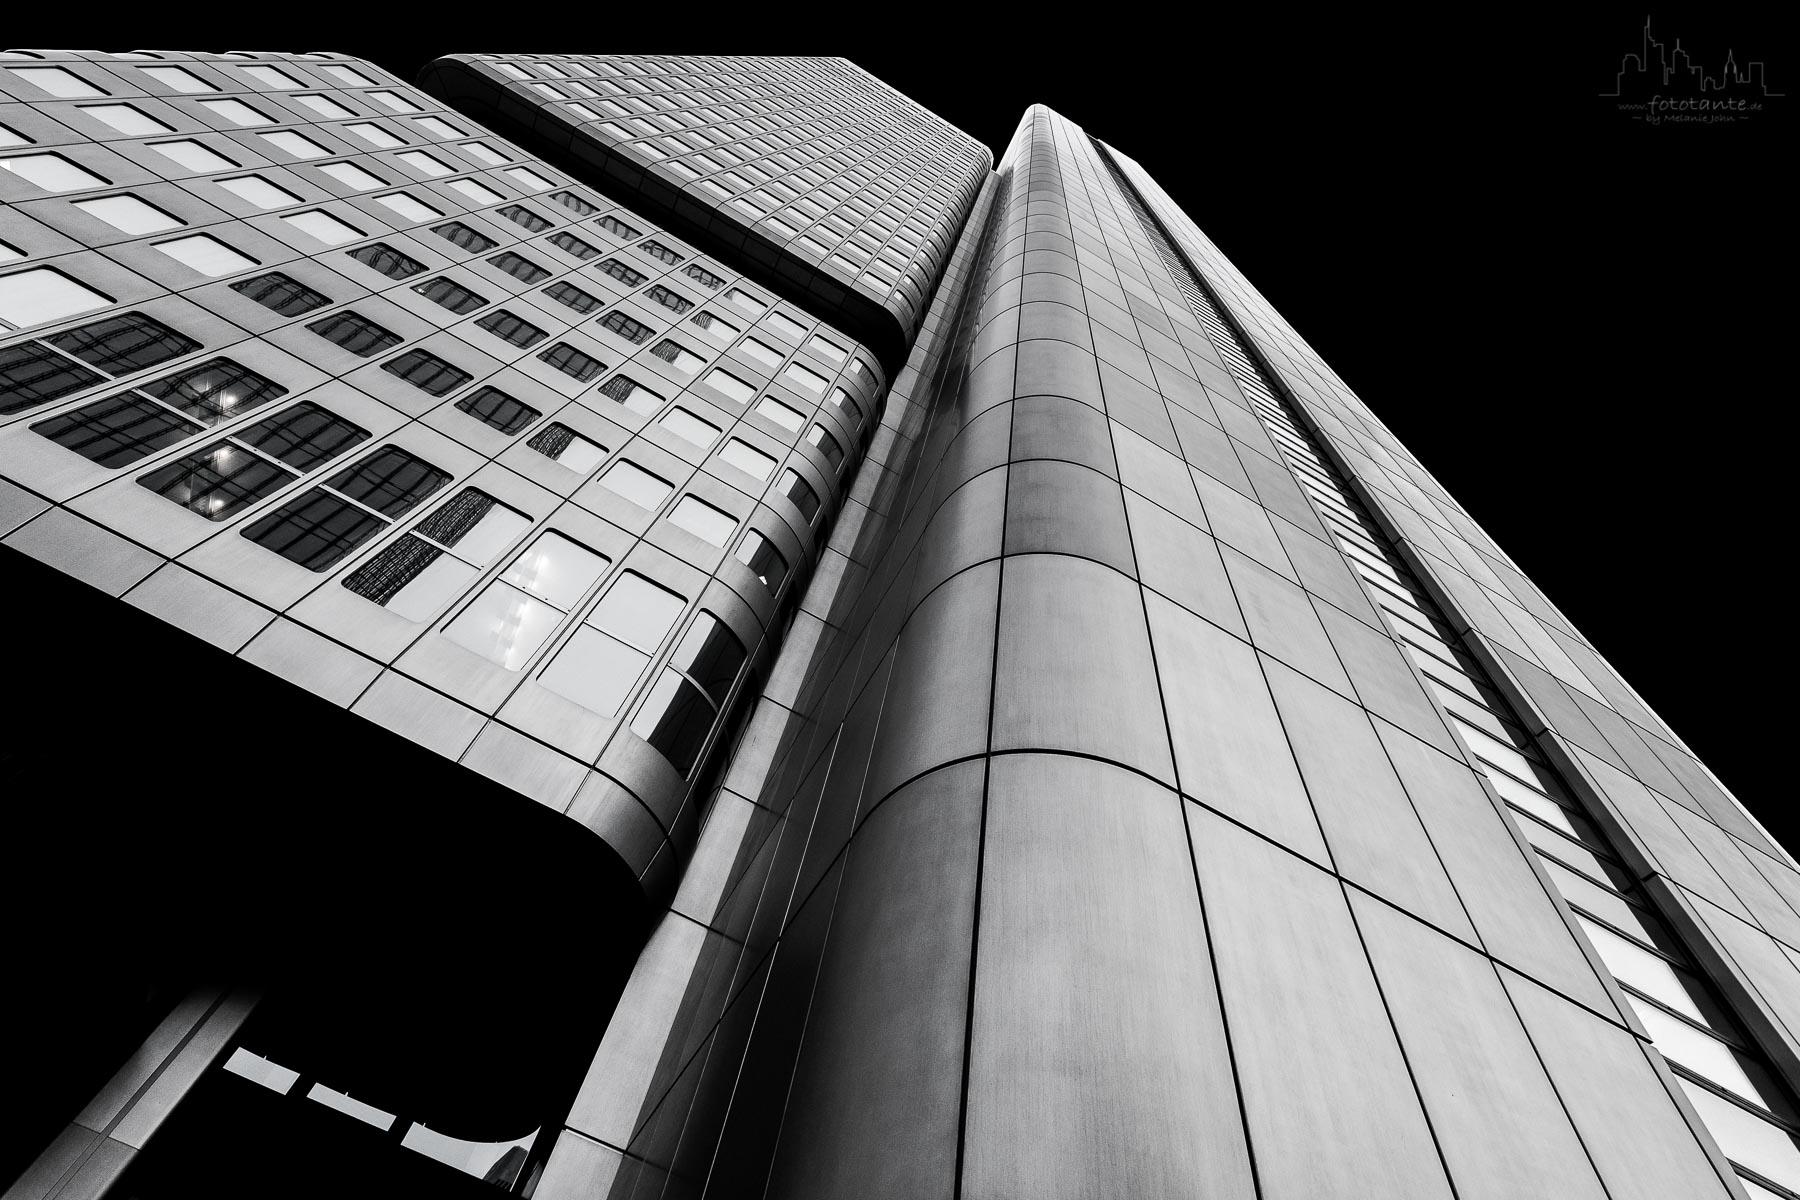 Frankfurt architektur fototante for Architektur frankfurt